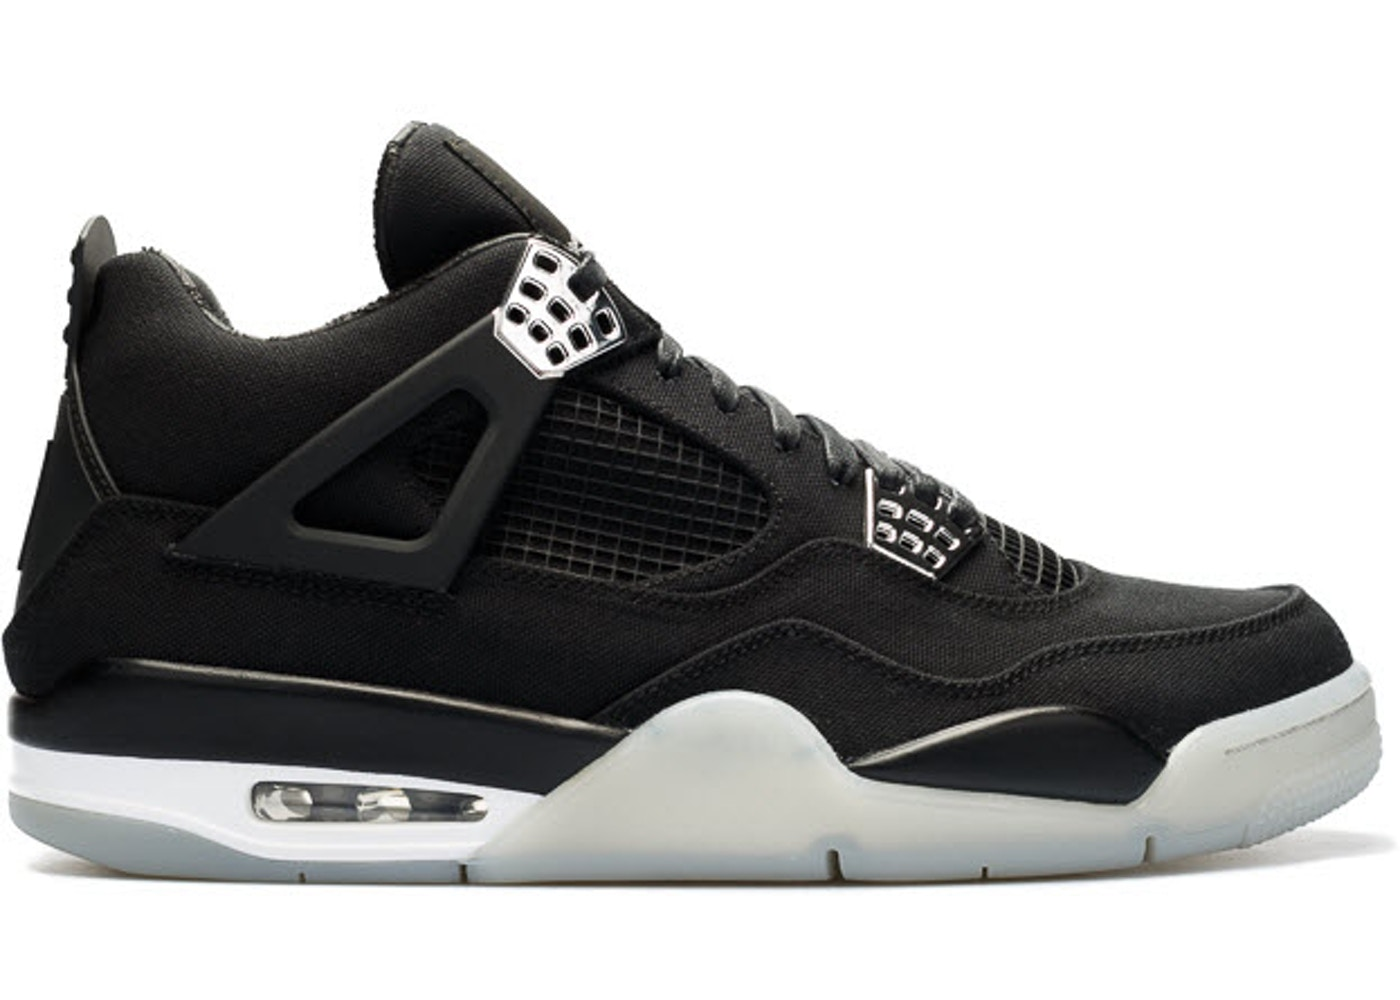 e177e5f244a6 Buy Air Jordan 4 Shoes   Deadstock Sneakers